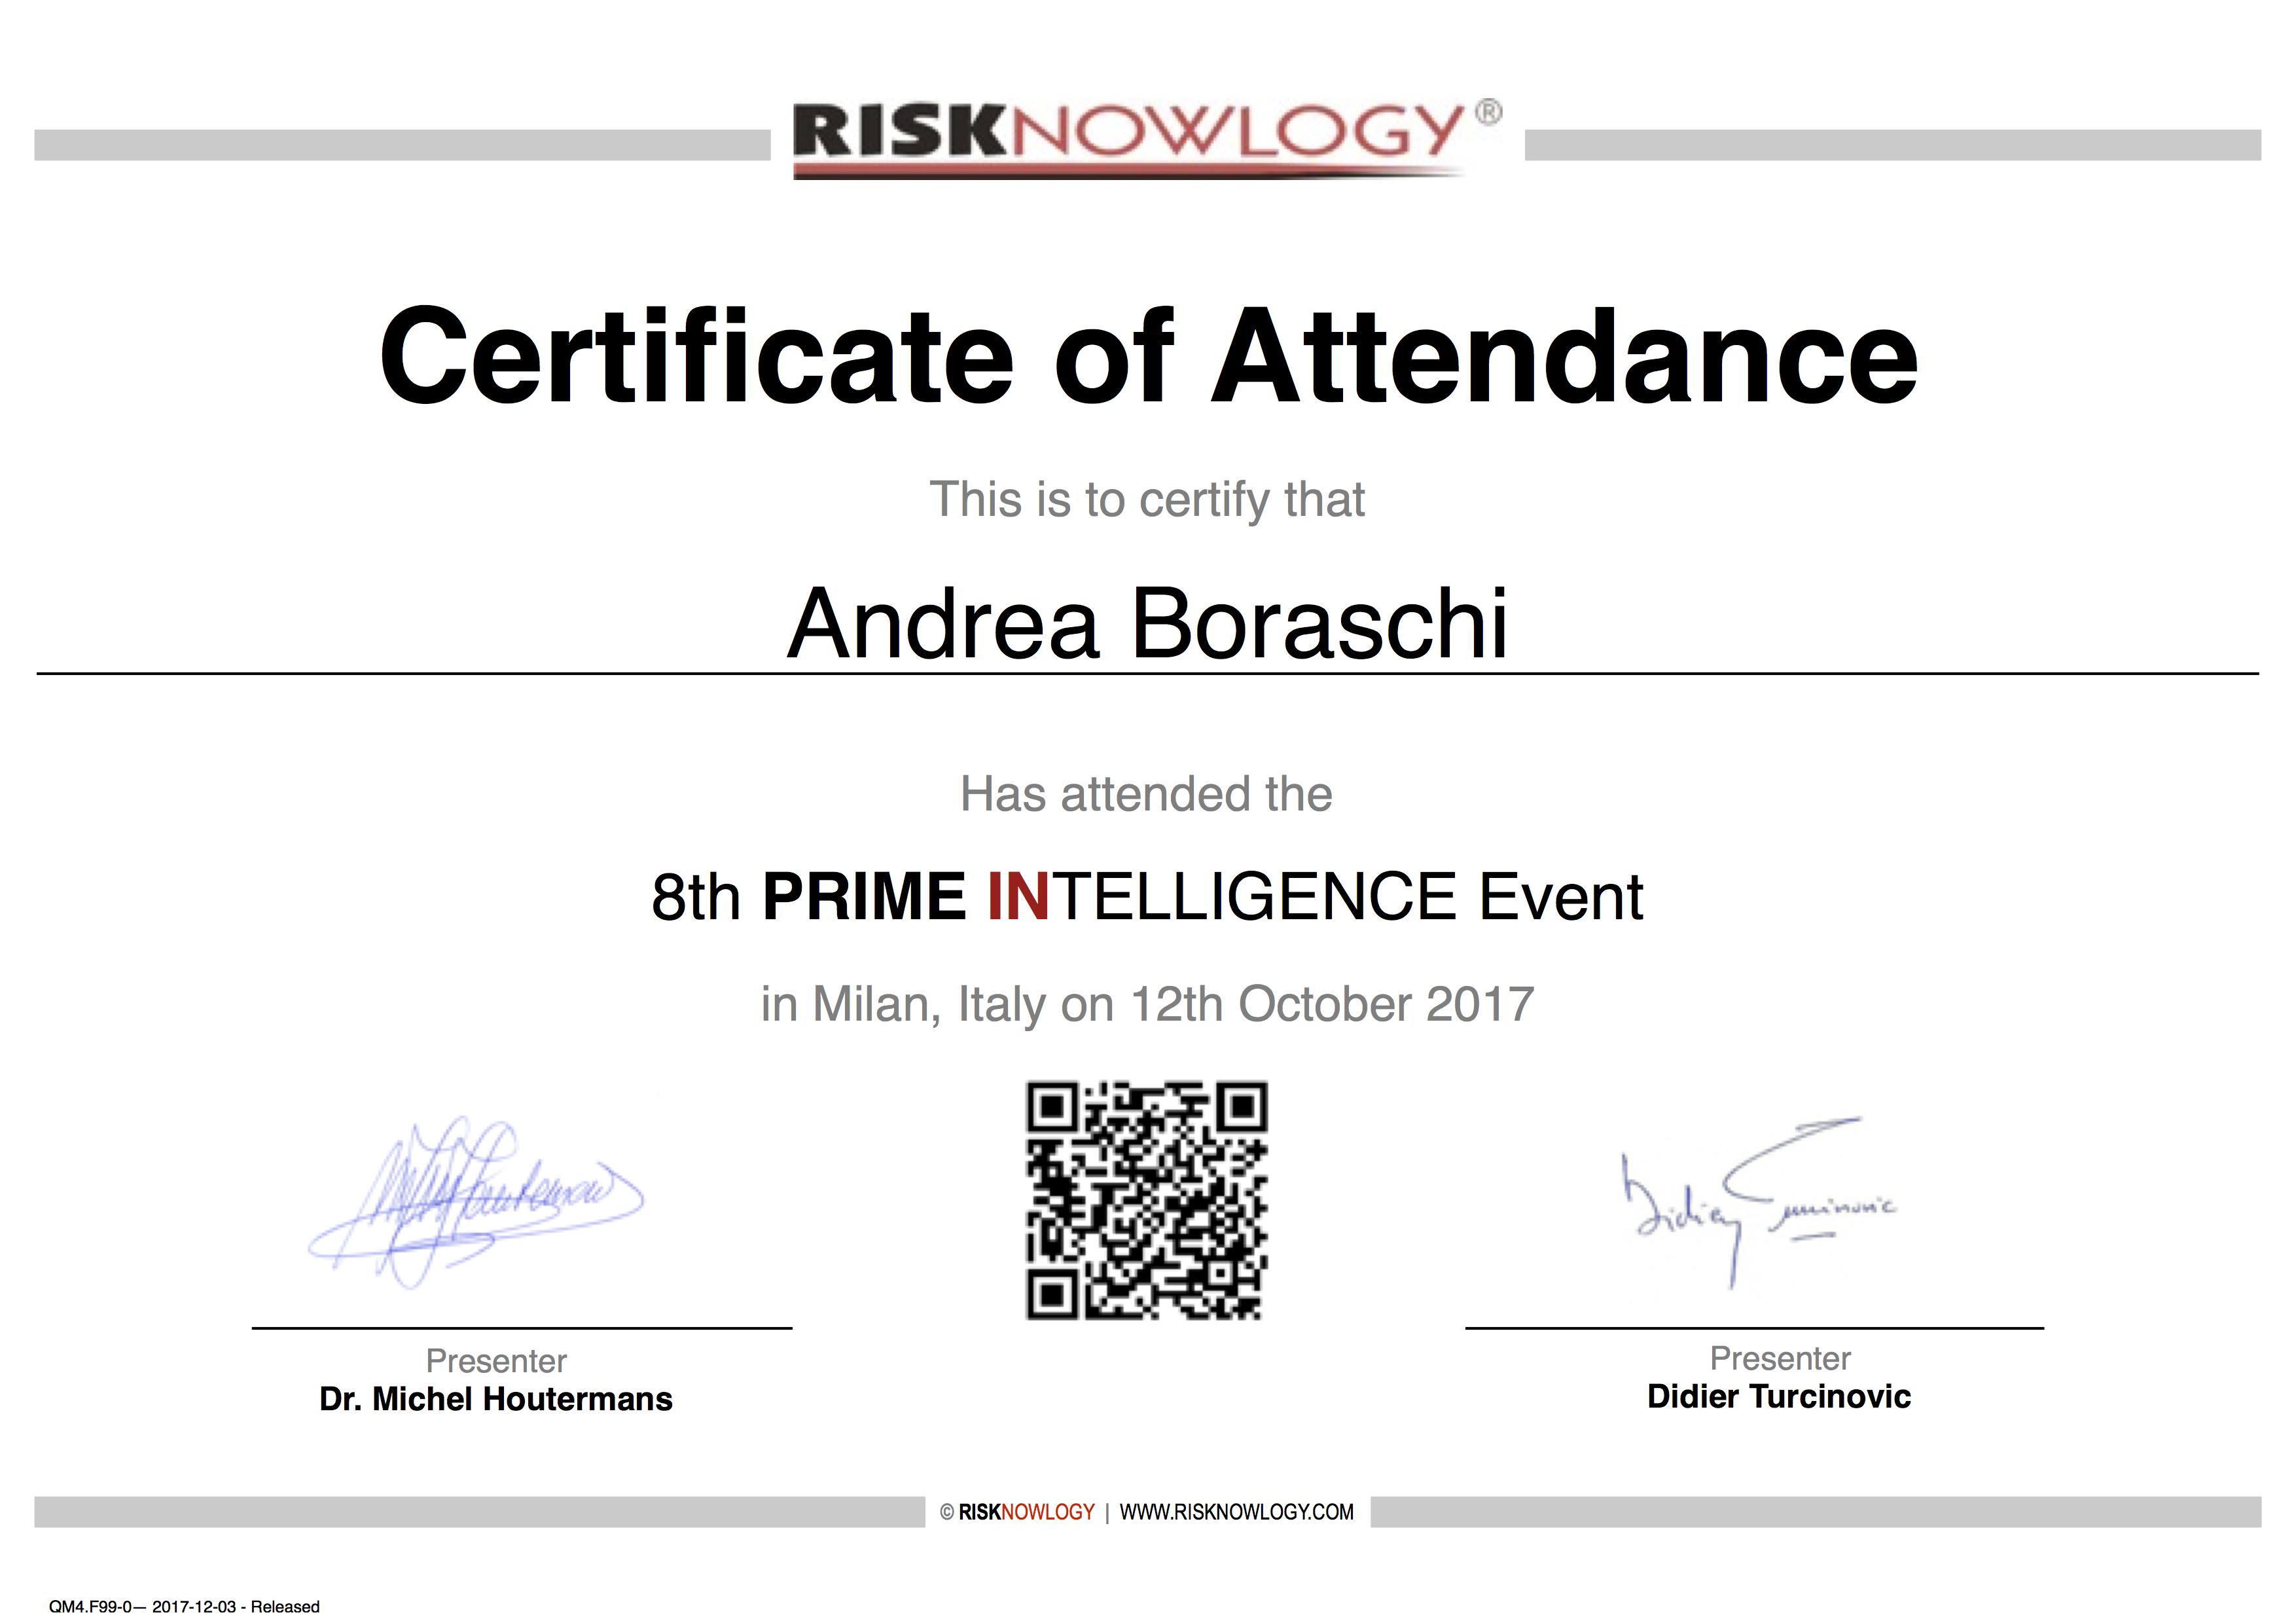 Safety Passport Of Andrea Boraschi